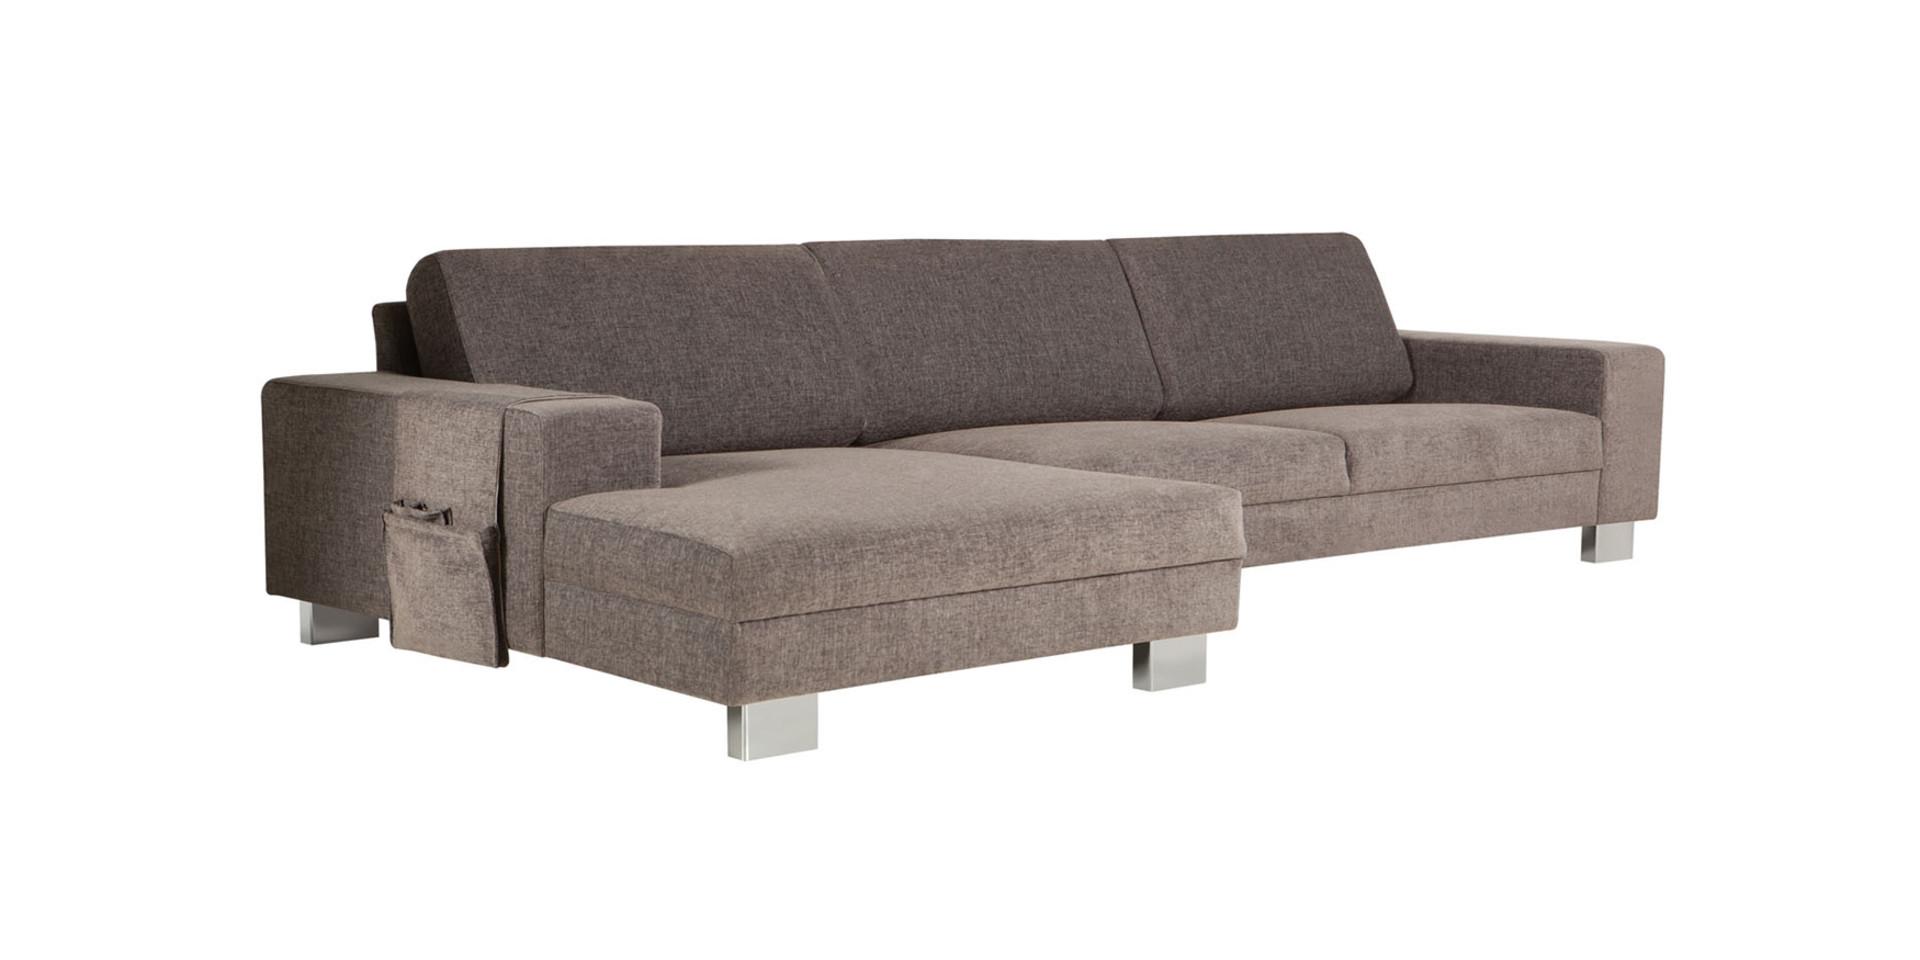 sits-quattro-angle-set2_divine70_grey_2